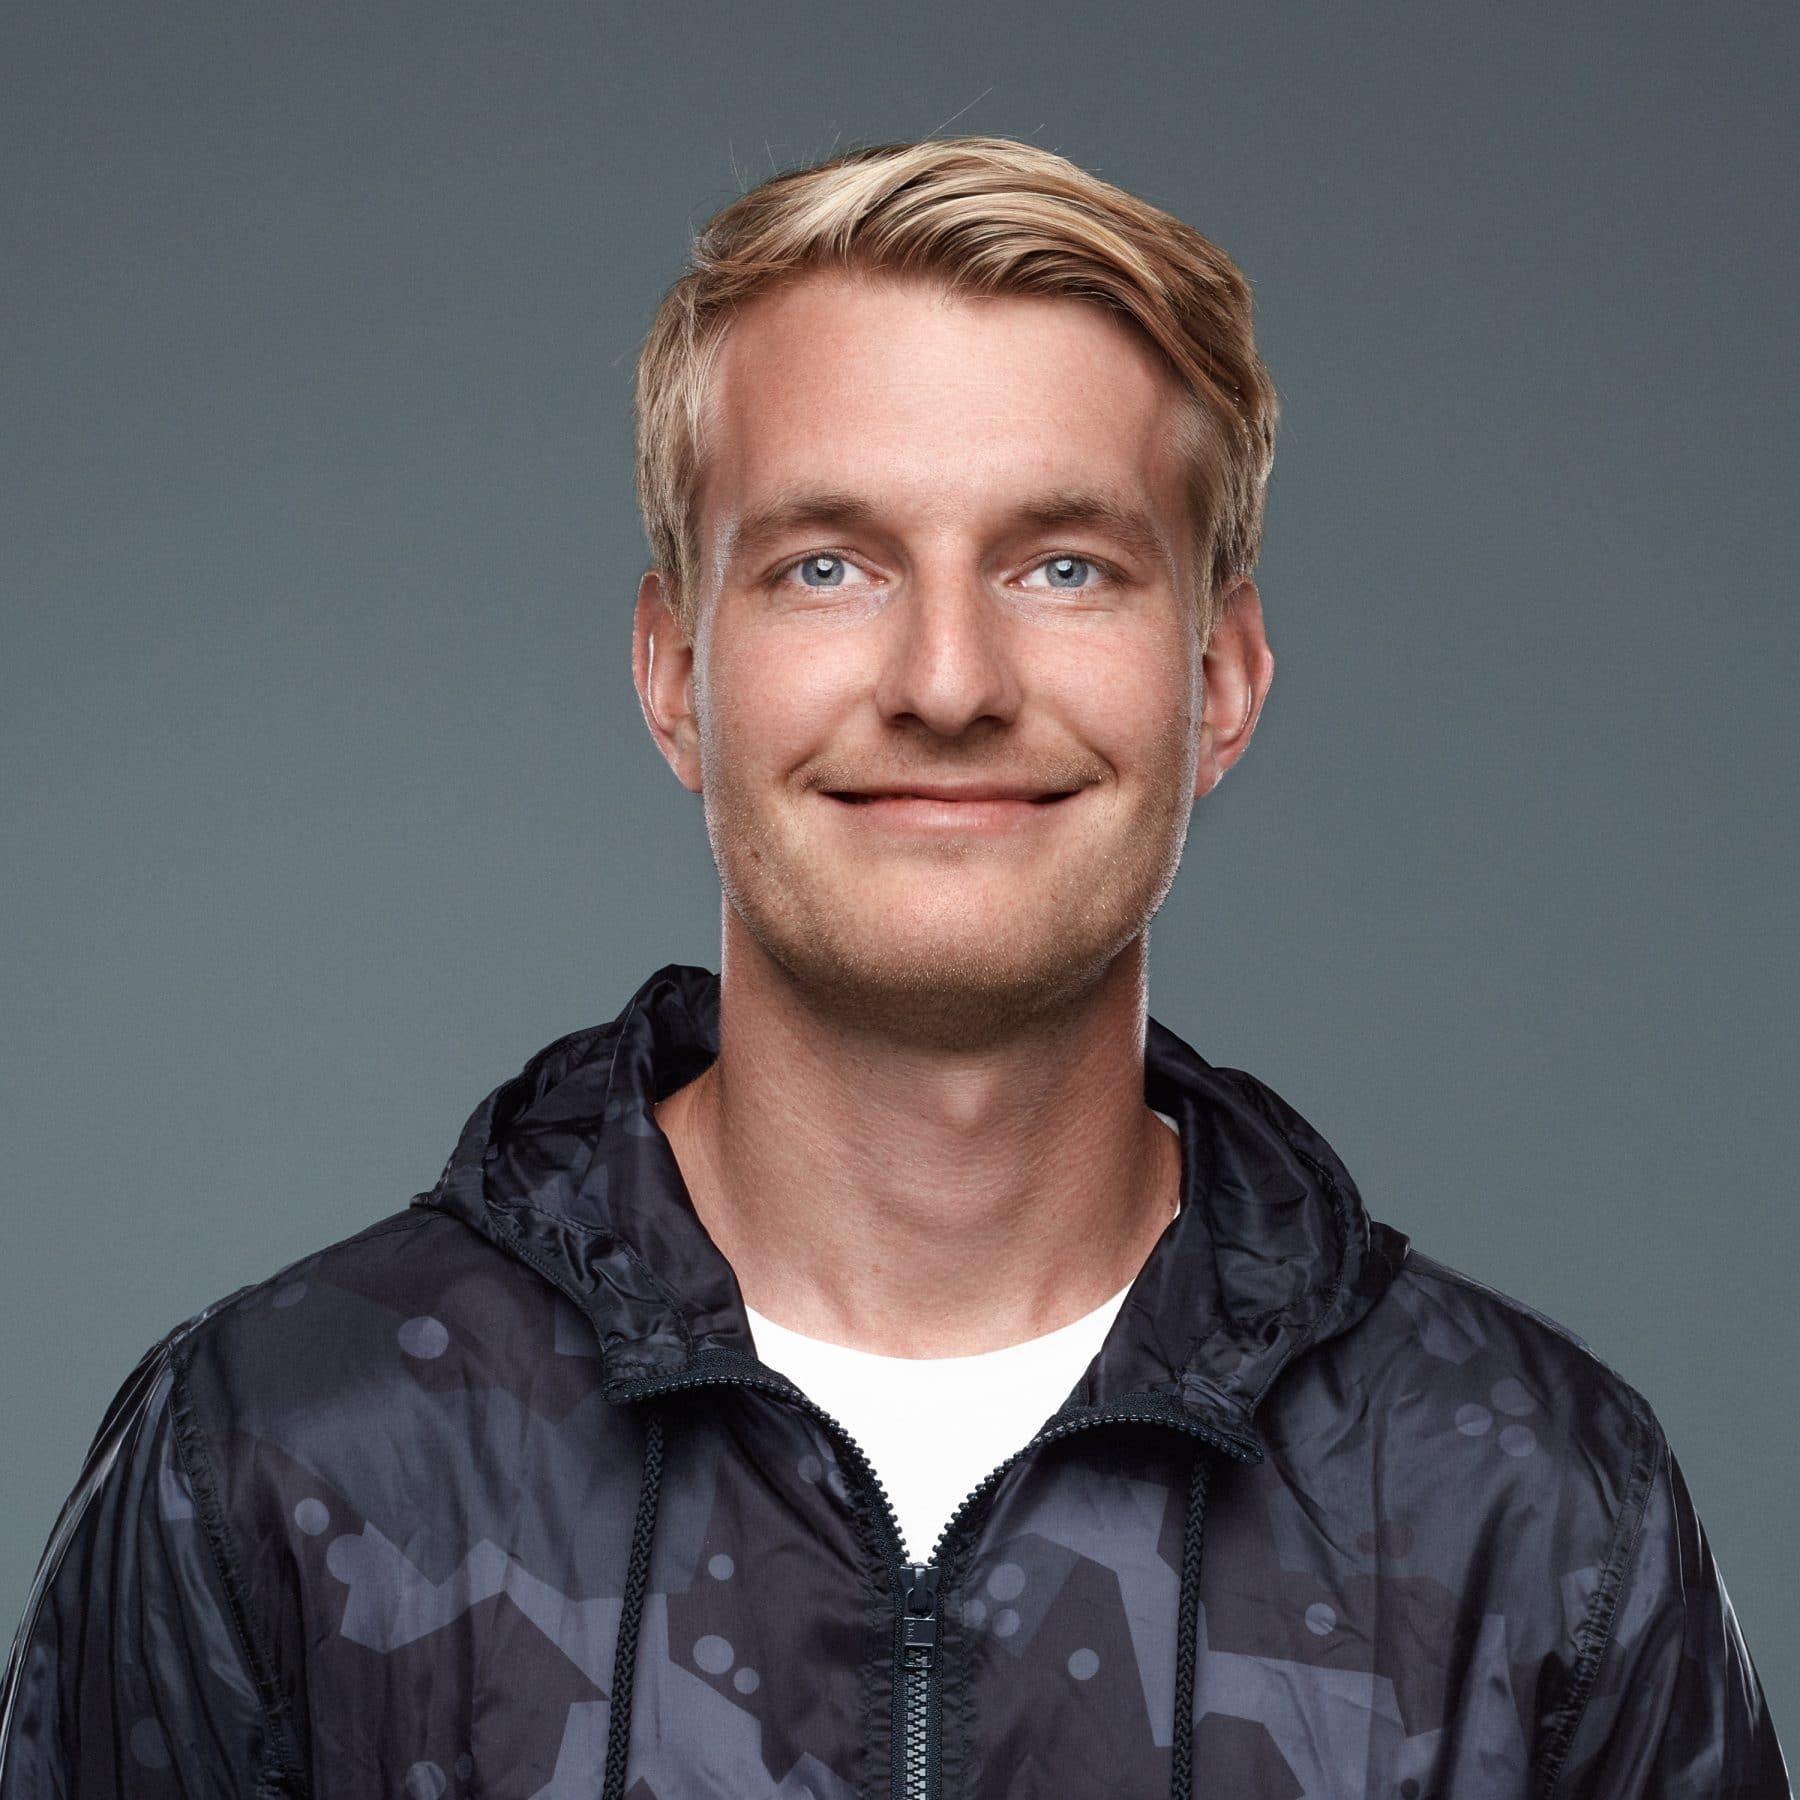 Tobias Möllerfors